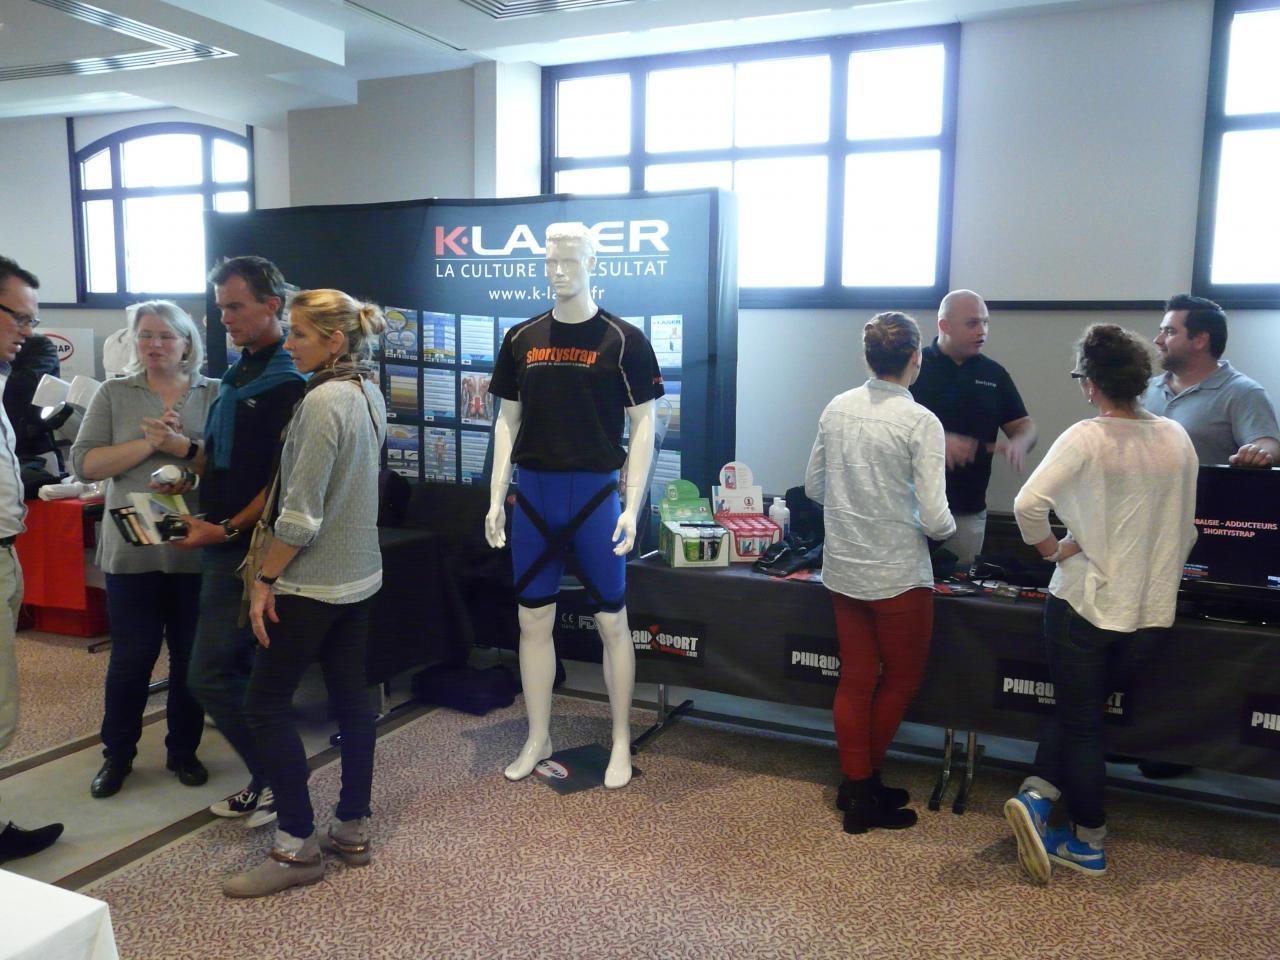 Les sponsors avec Shorty Strap et K-laser